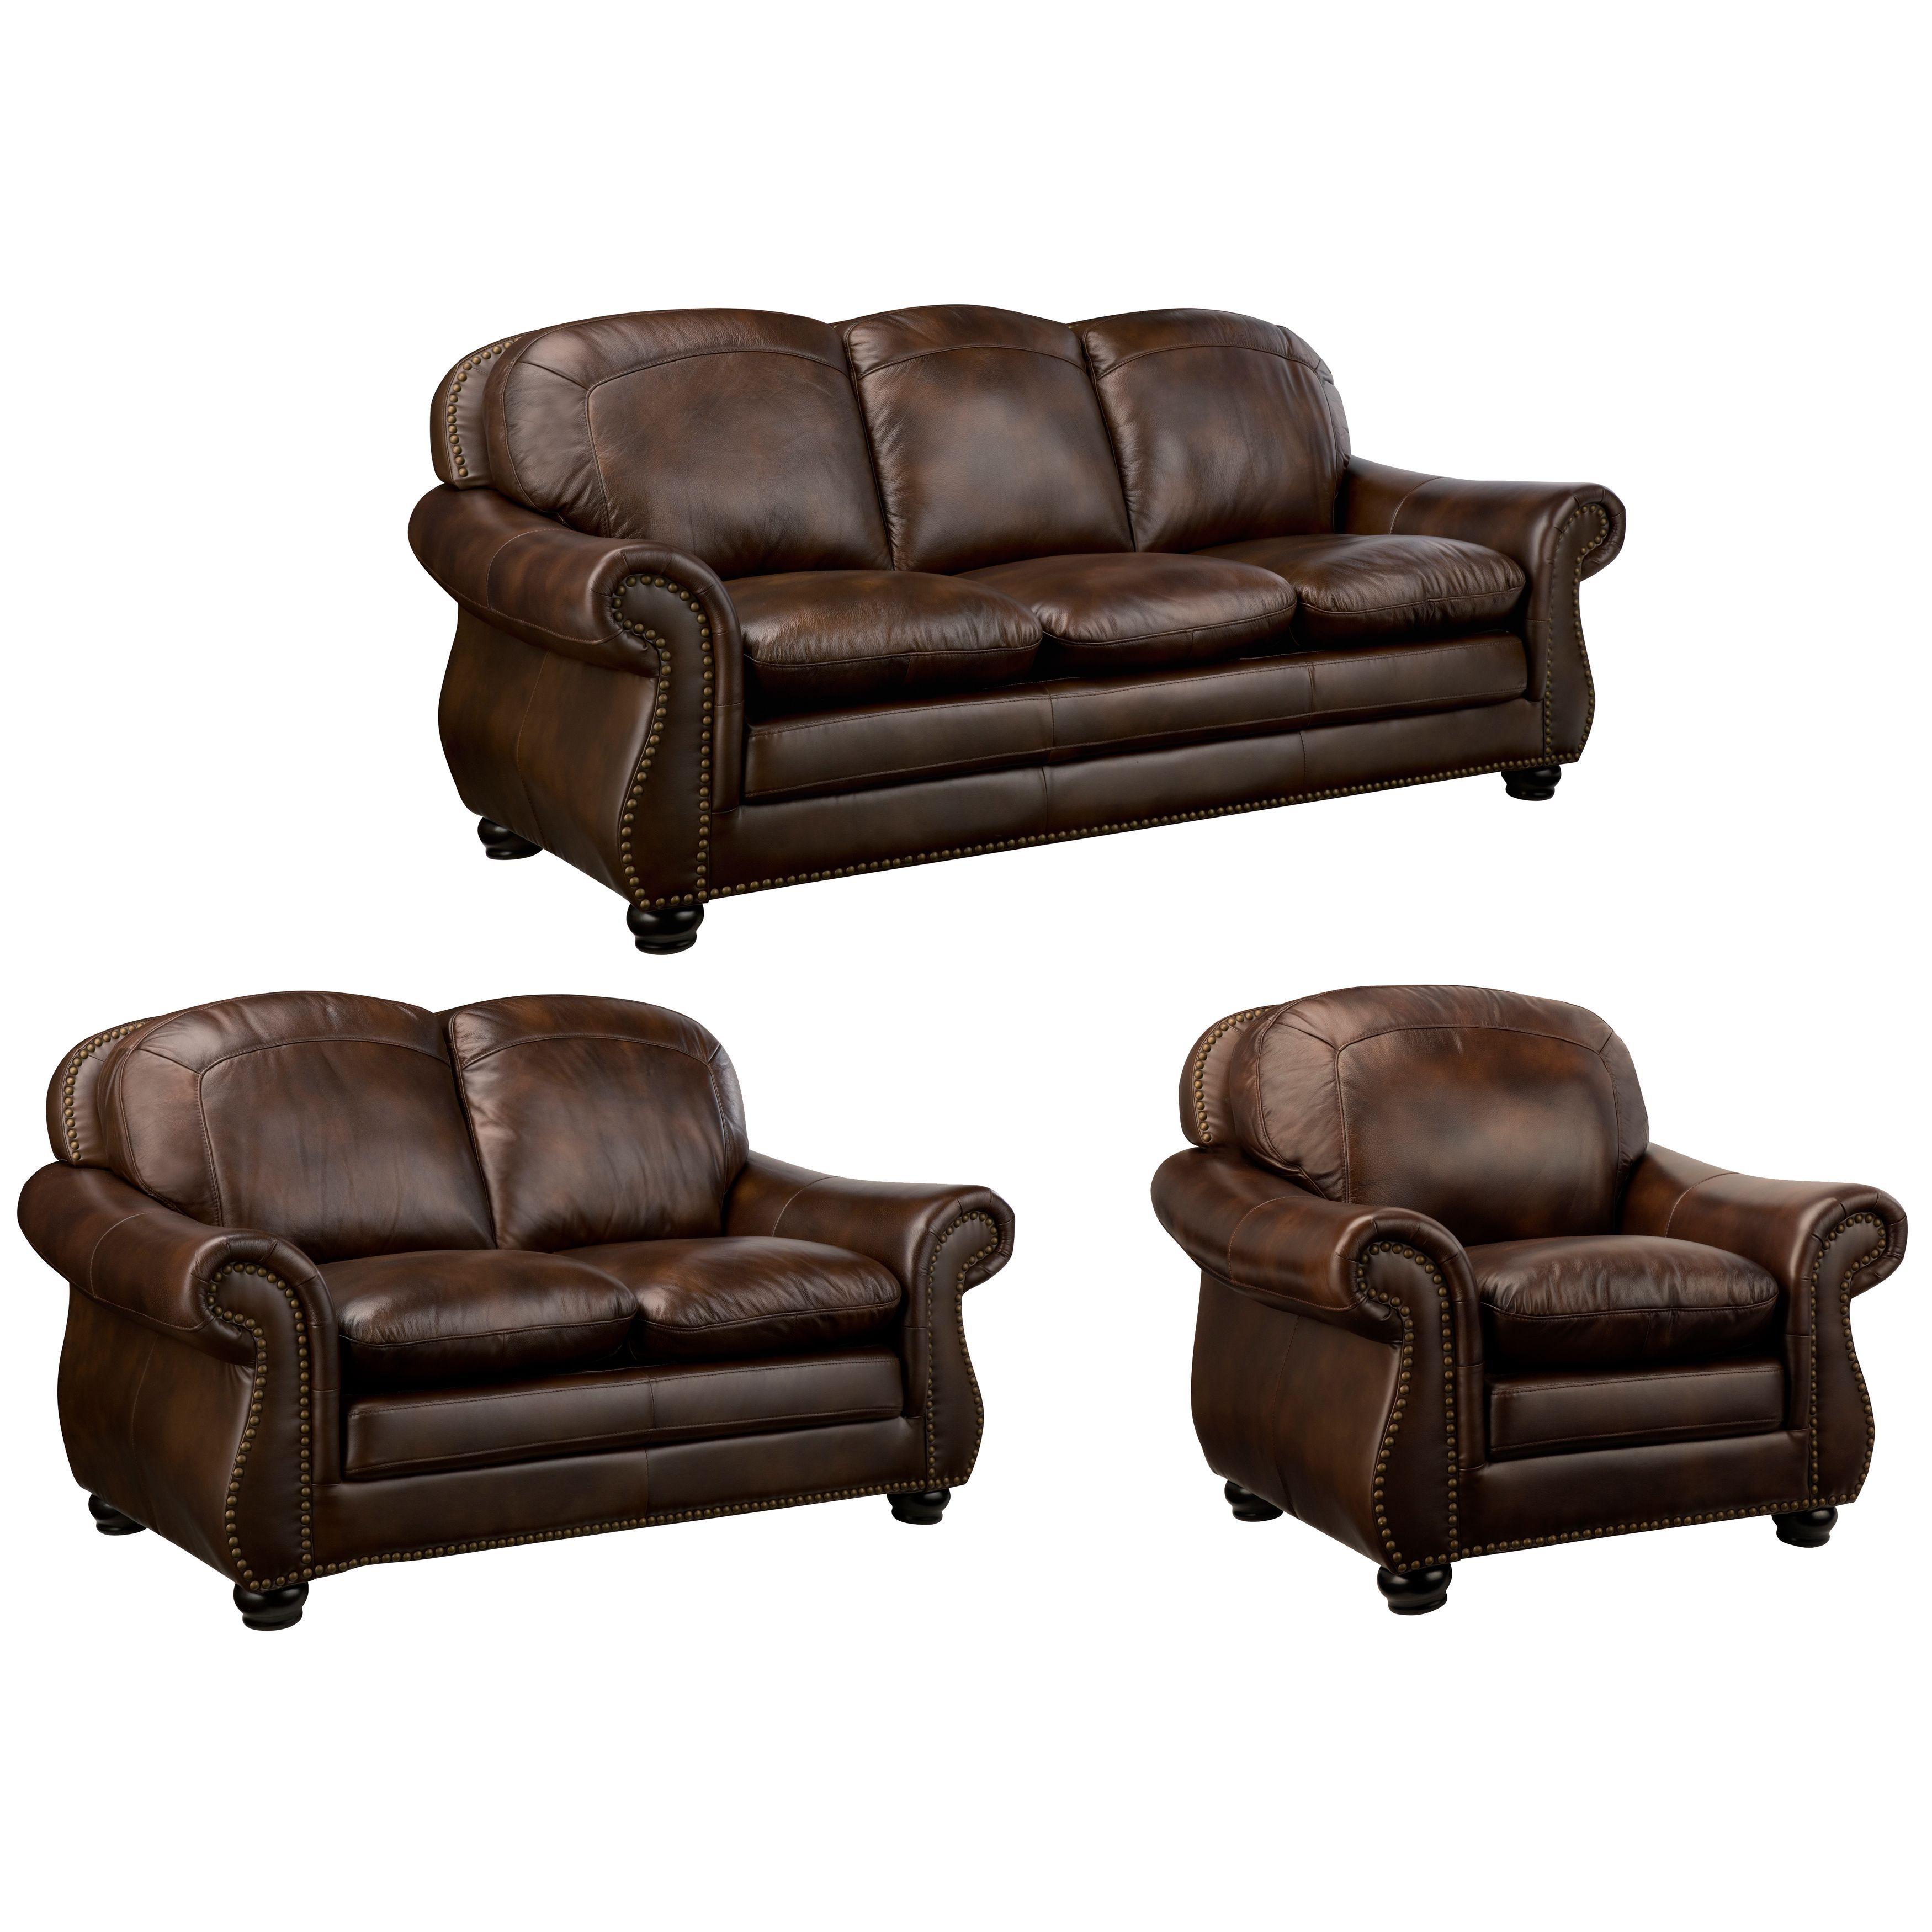 Monterrey Premium Brown Top Grain Leather Sofa Loveseat and Chair